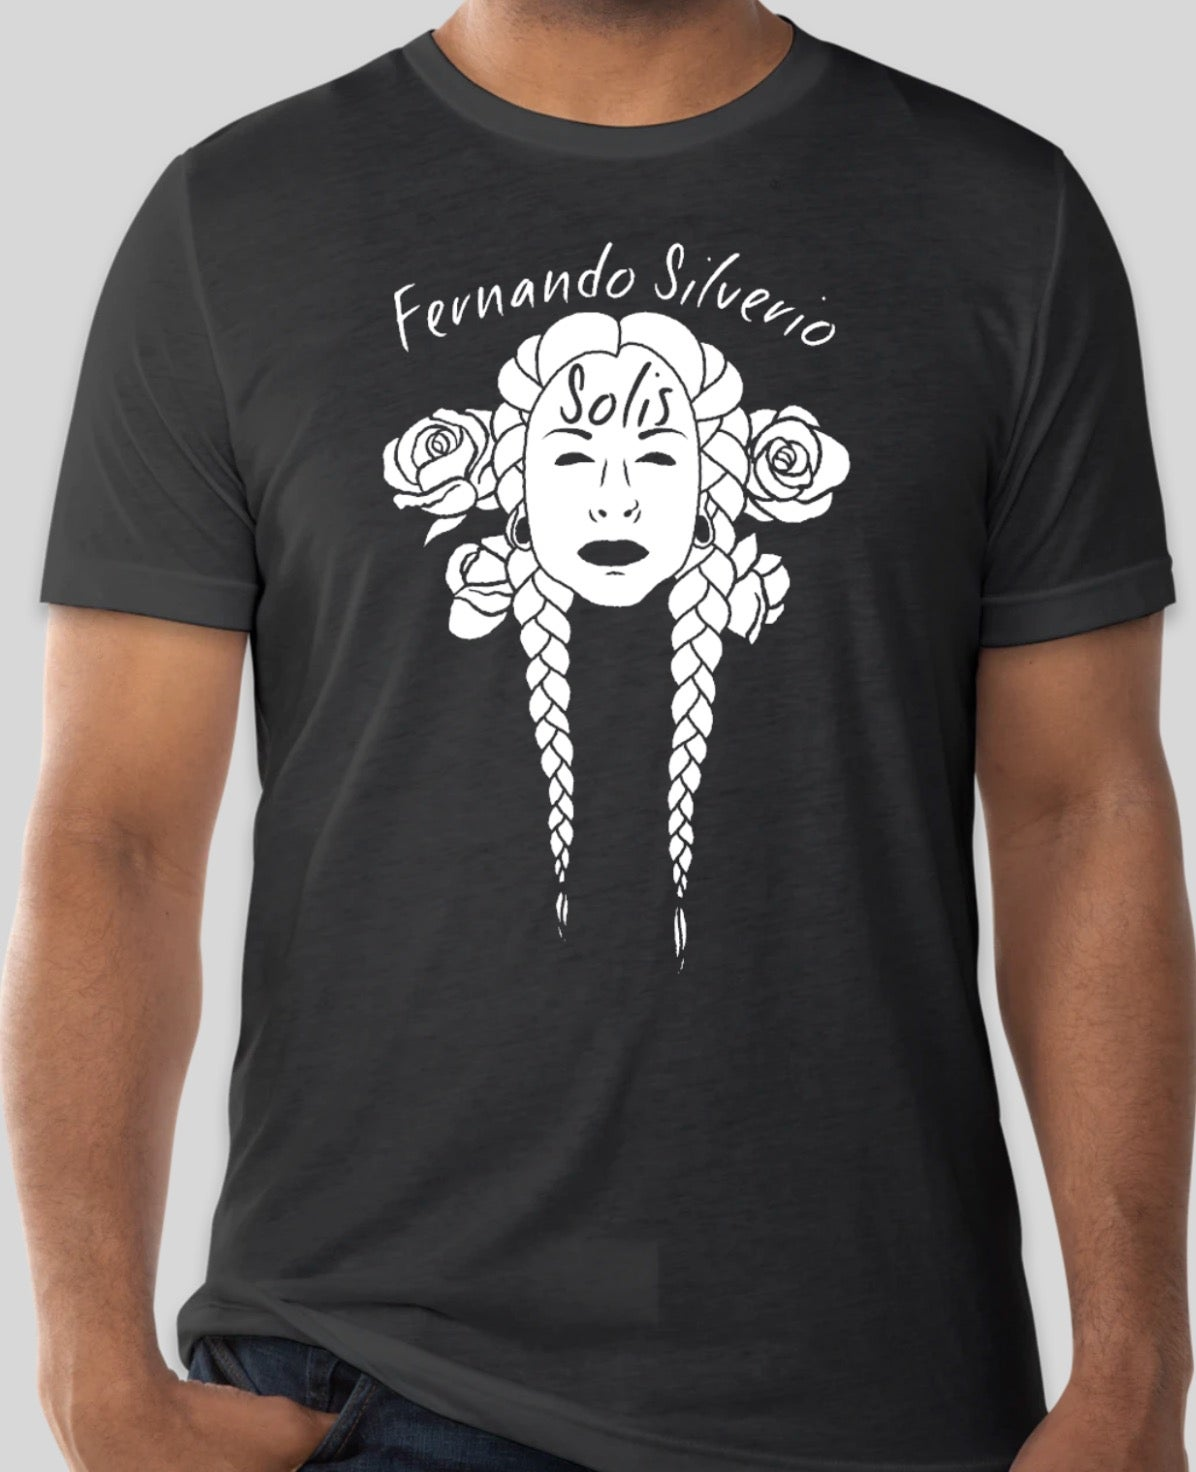 Image of Braids & Roses Shirt (Charcoal Black, Denim, Solid Black)